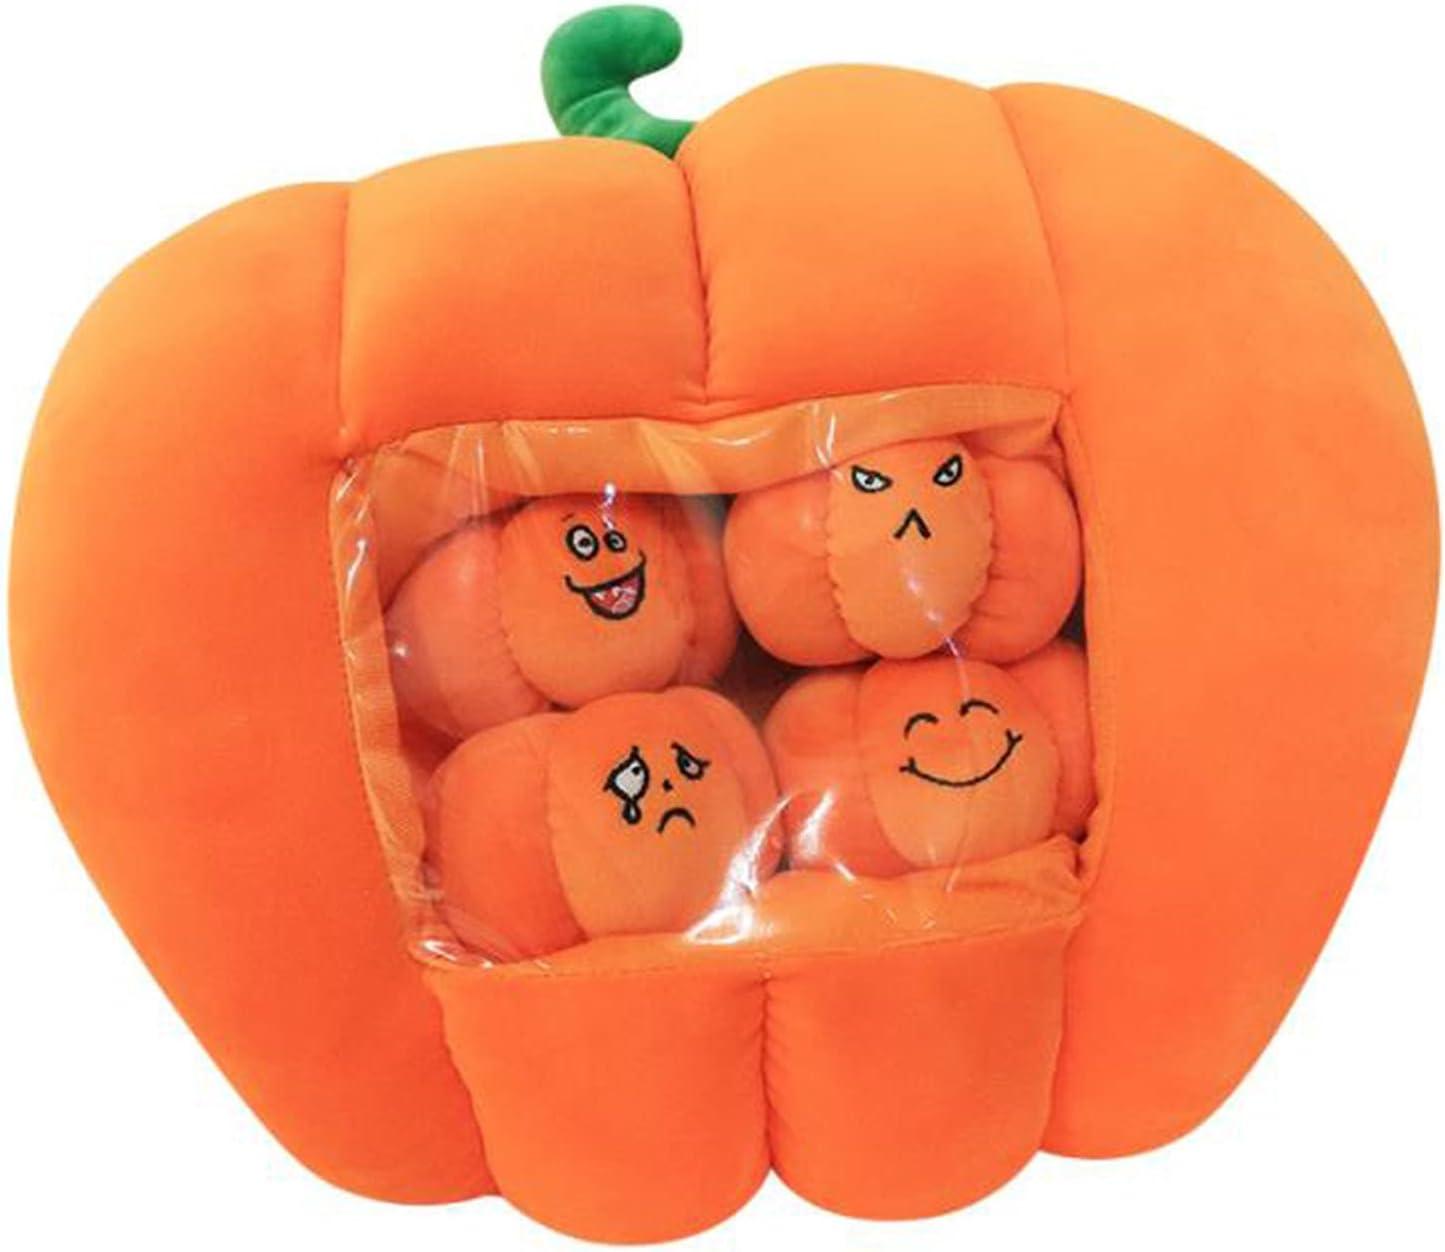 ABCD Halloween Manufacturer direct delivery Pumpkin Pillow Detachabl Nap Warmer Hand Lowest price challenge